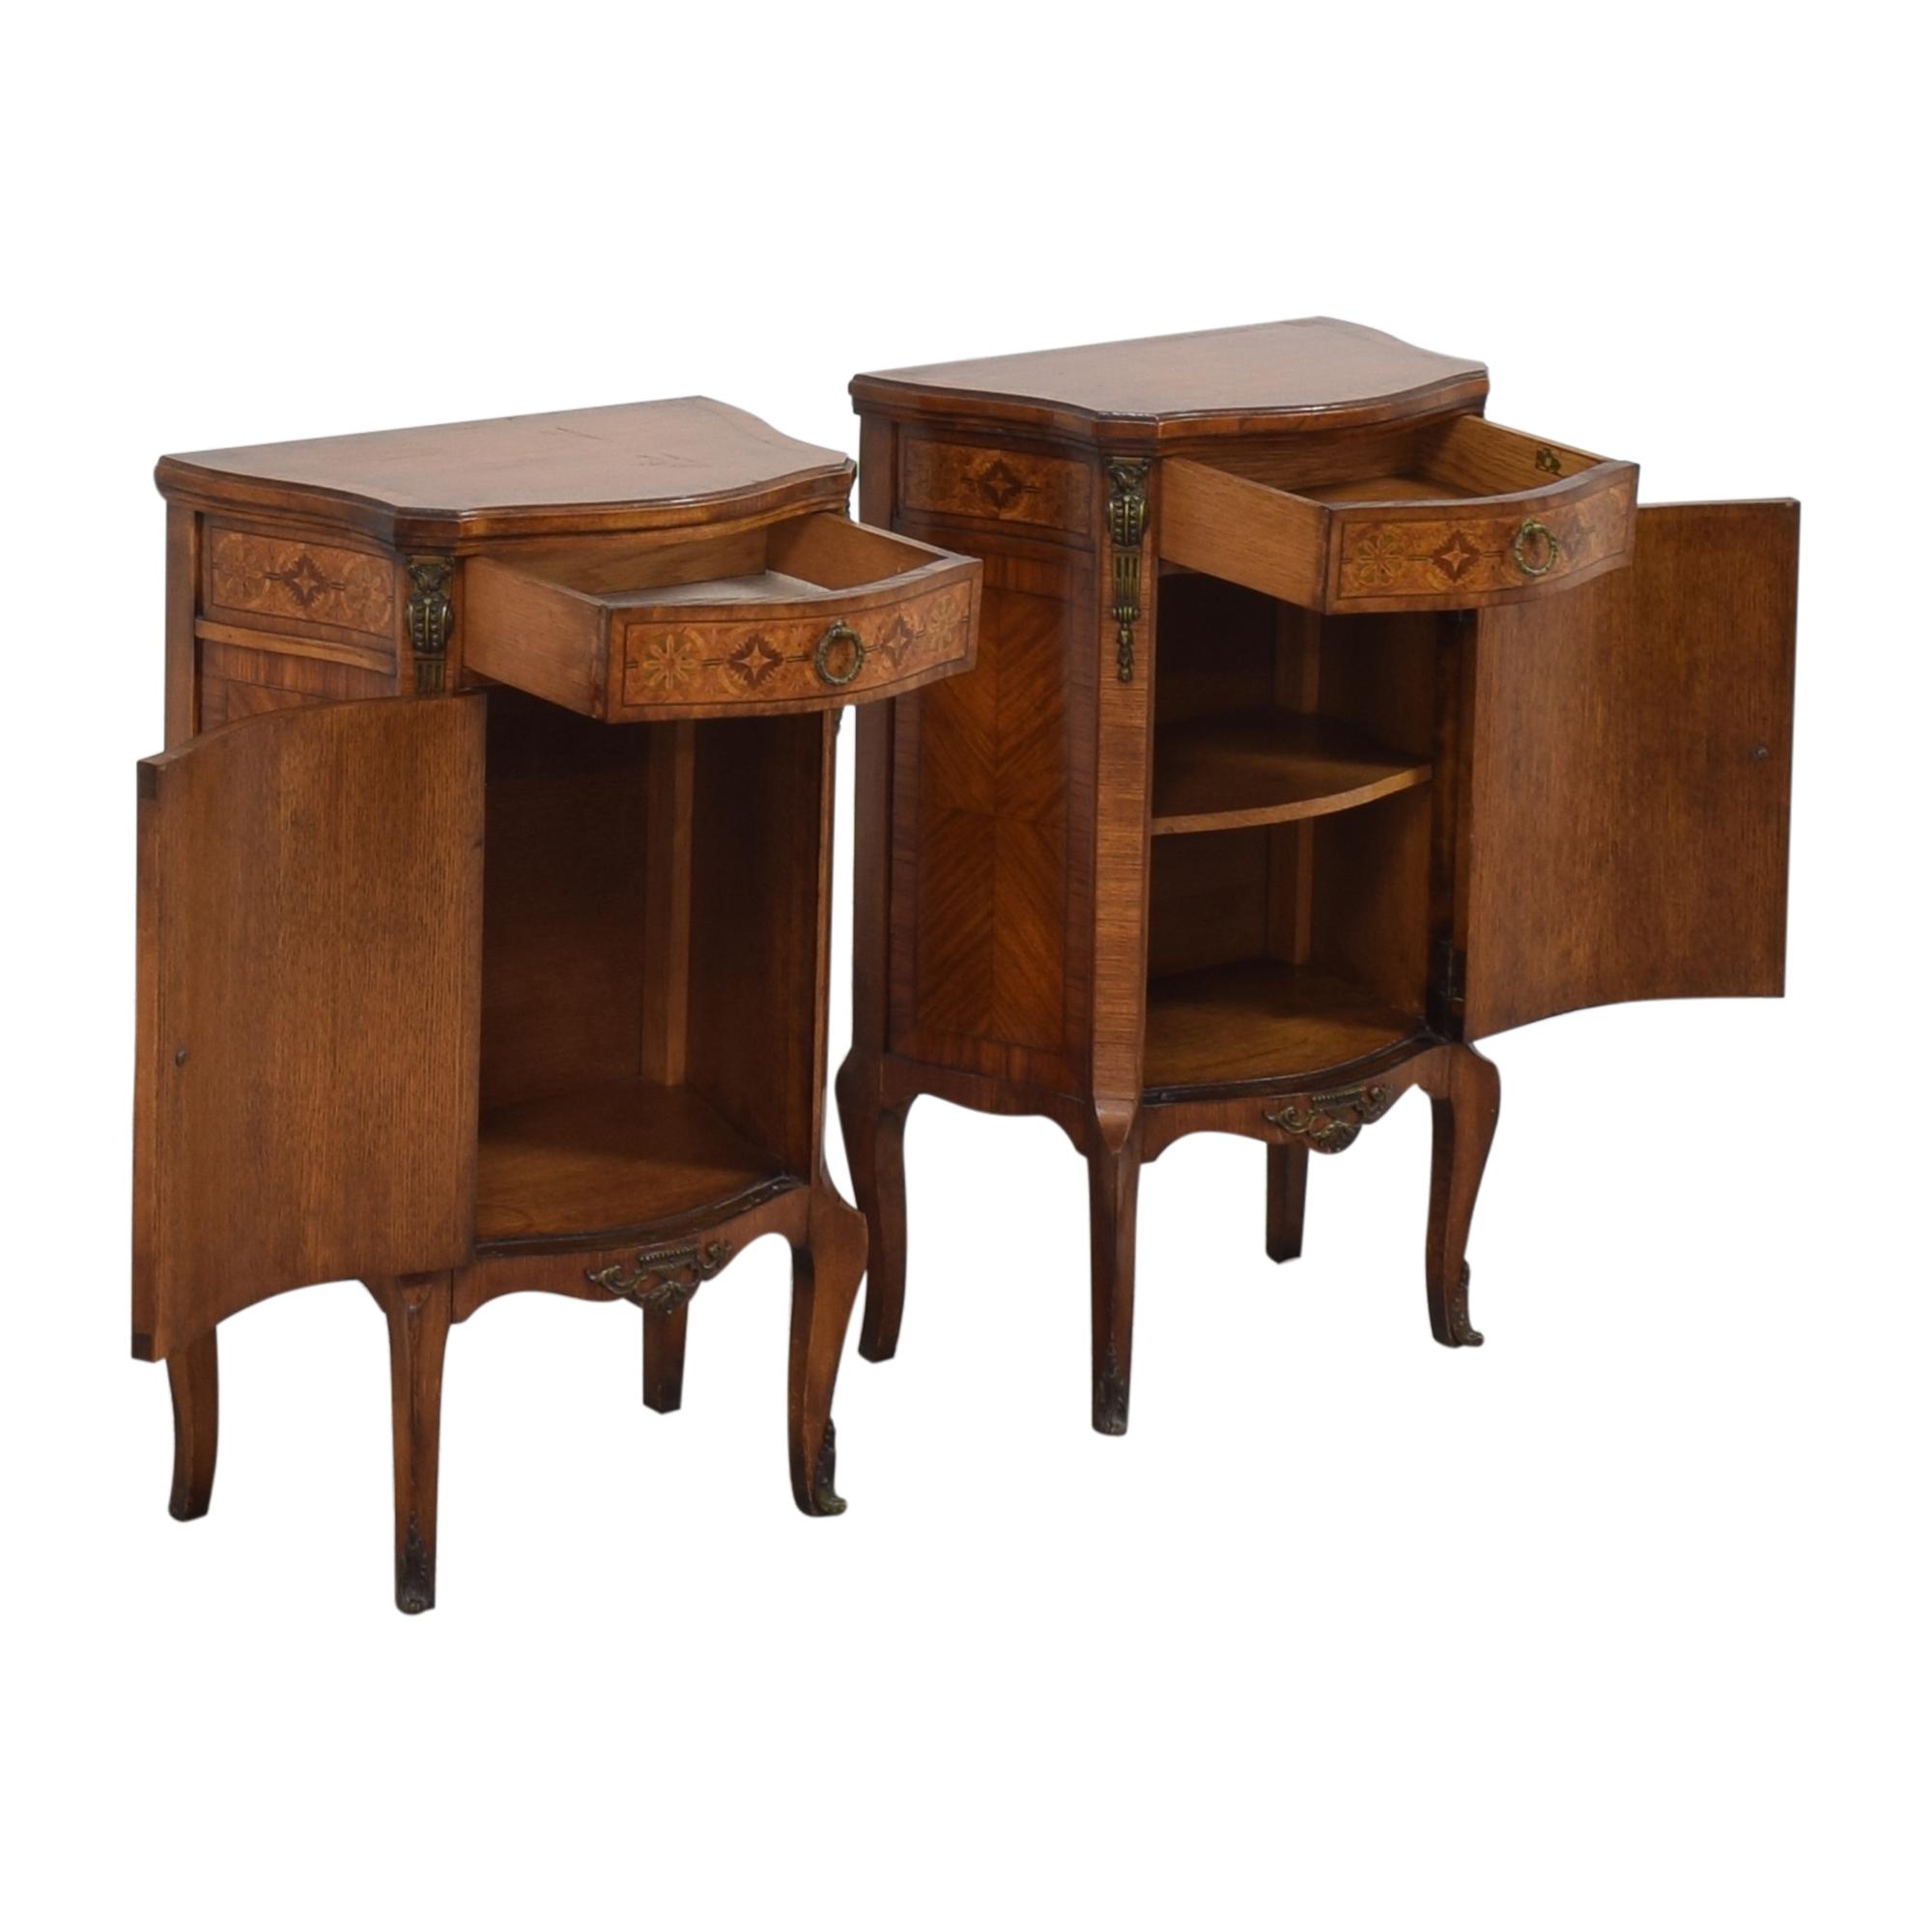 Bethlehem Furniture Company Bethlehem Furniture Company End Tables